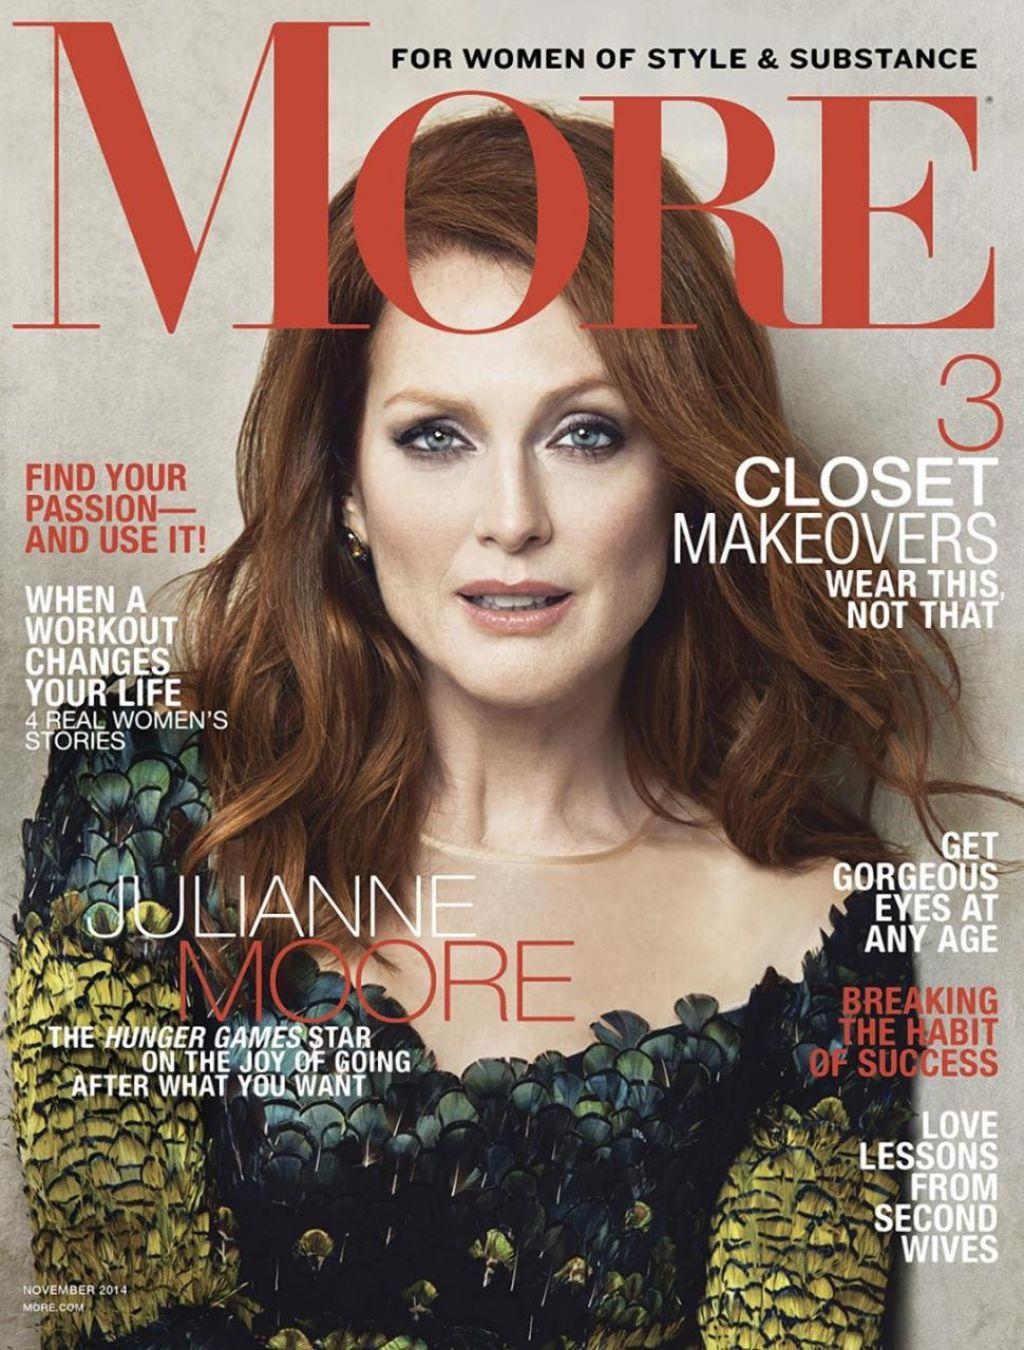 More Magazine November 2014 Issue